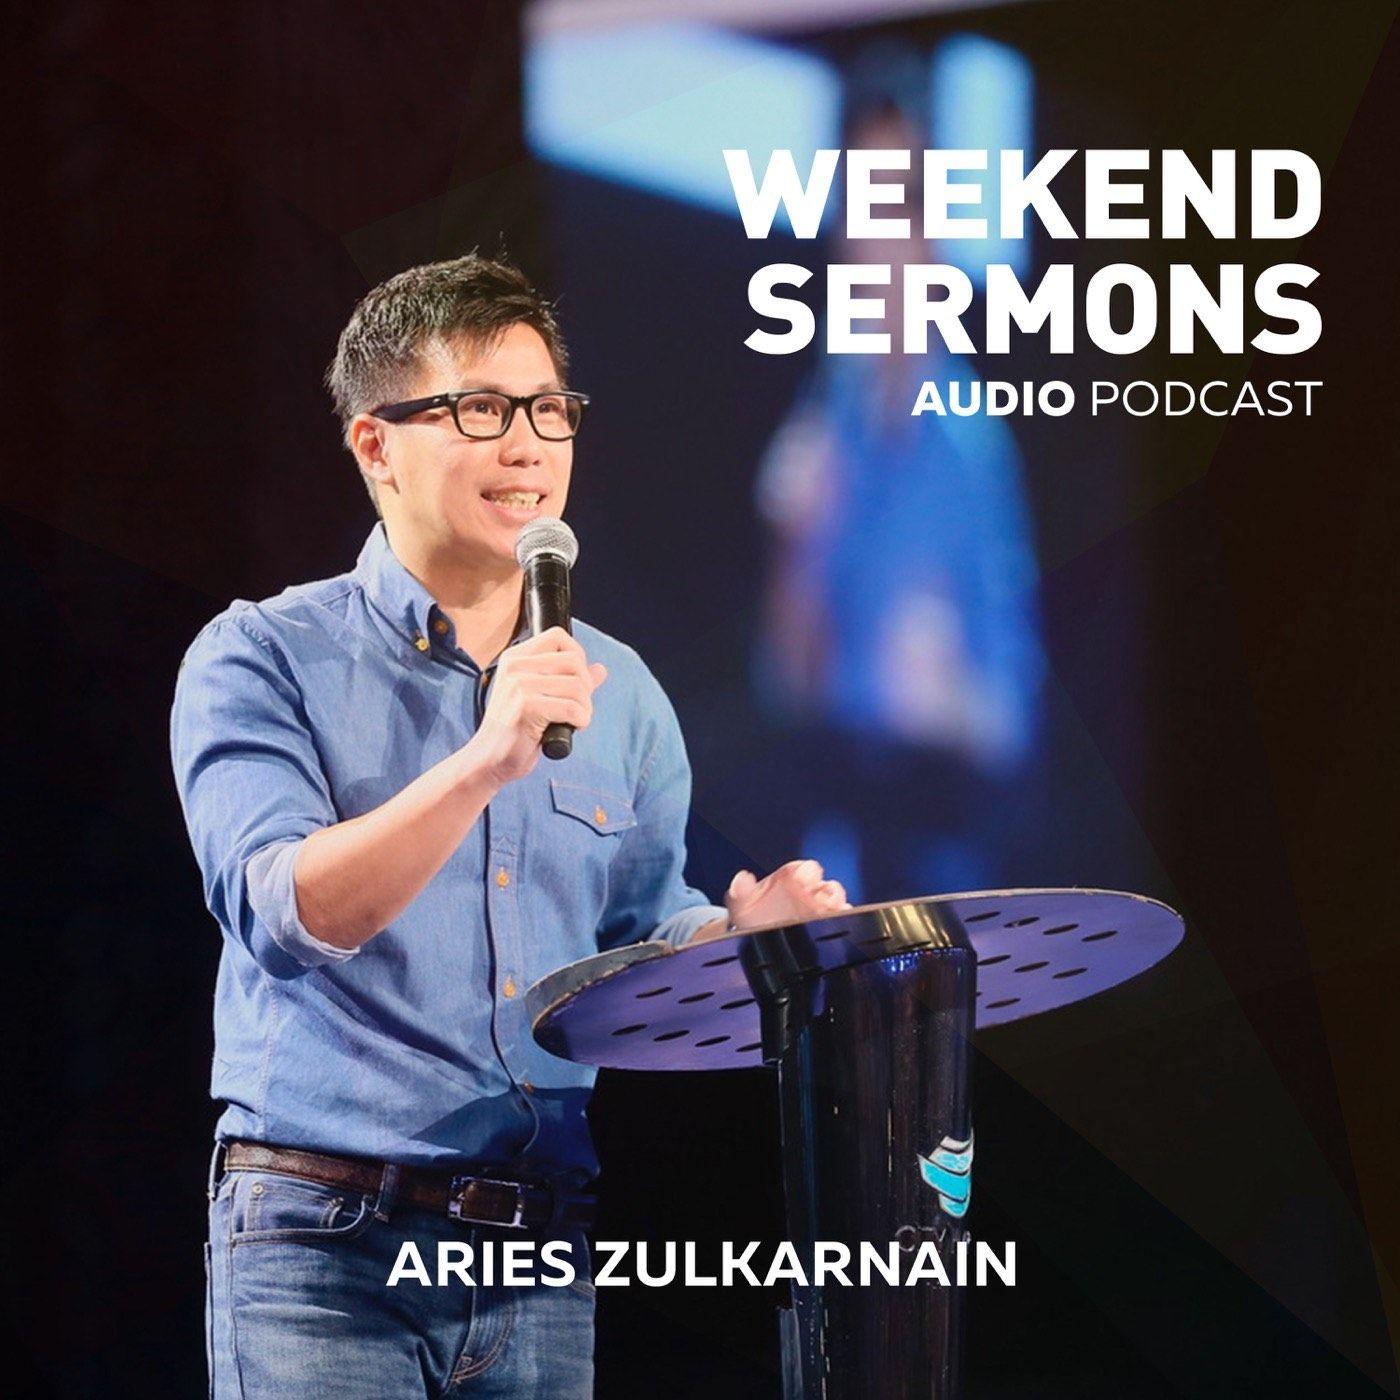 Aries Zulkarnain: Making Room For Christ